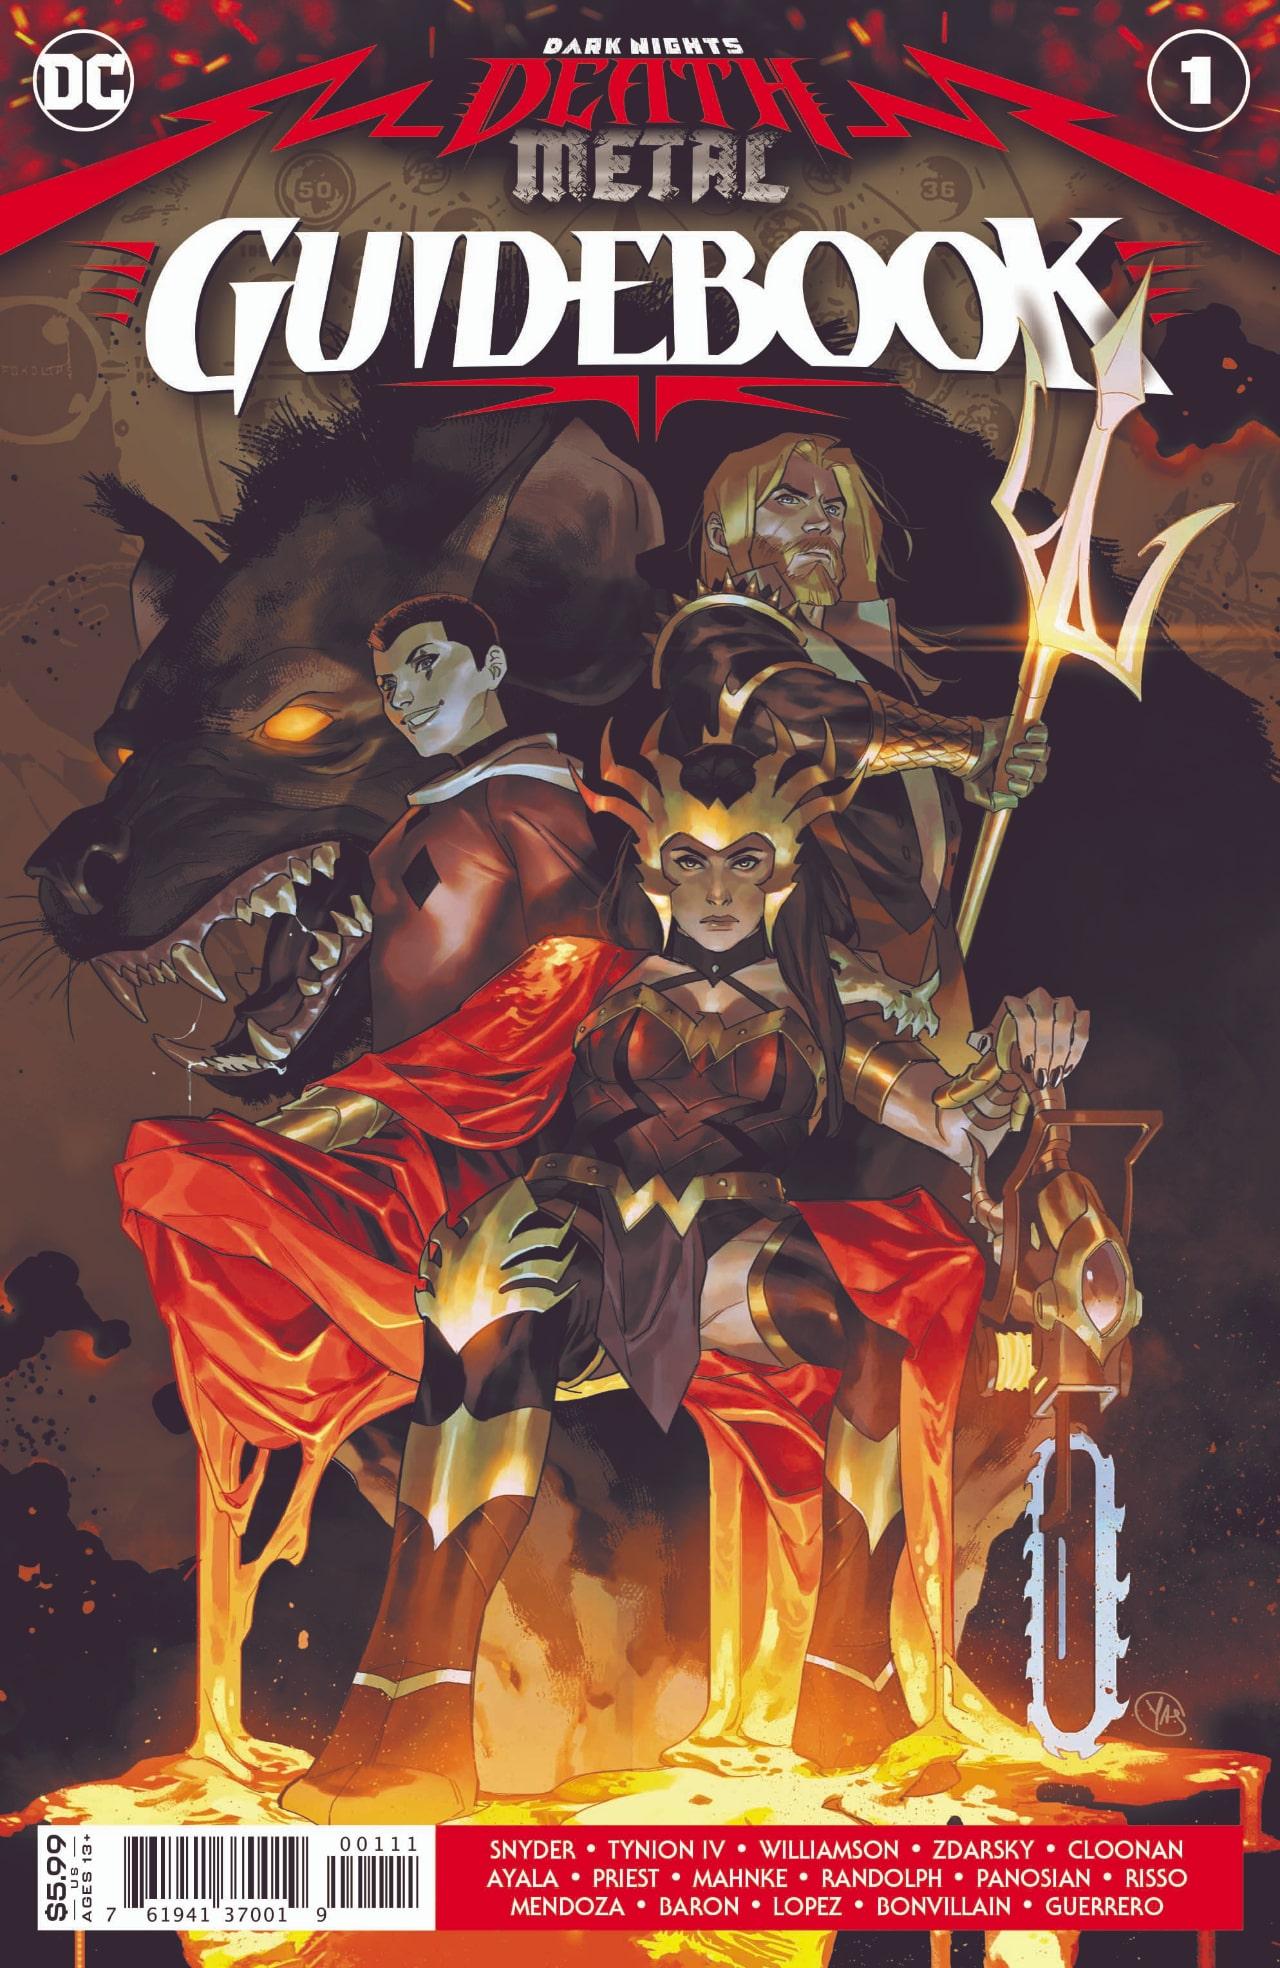 Meet the DCU Watcher in Dark Nights Death Metal Guidebook min